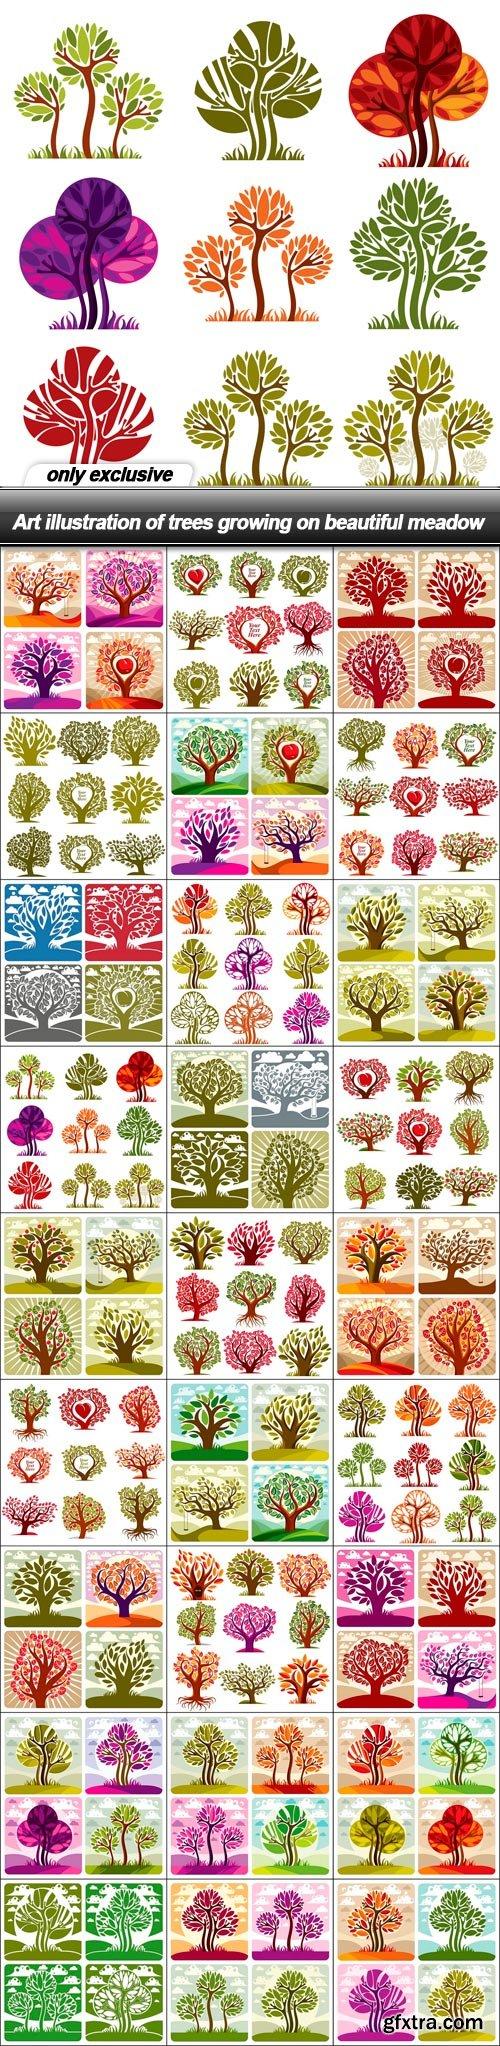 Art illustration of trees growing on beautiful meadow - 27 EPS